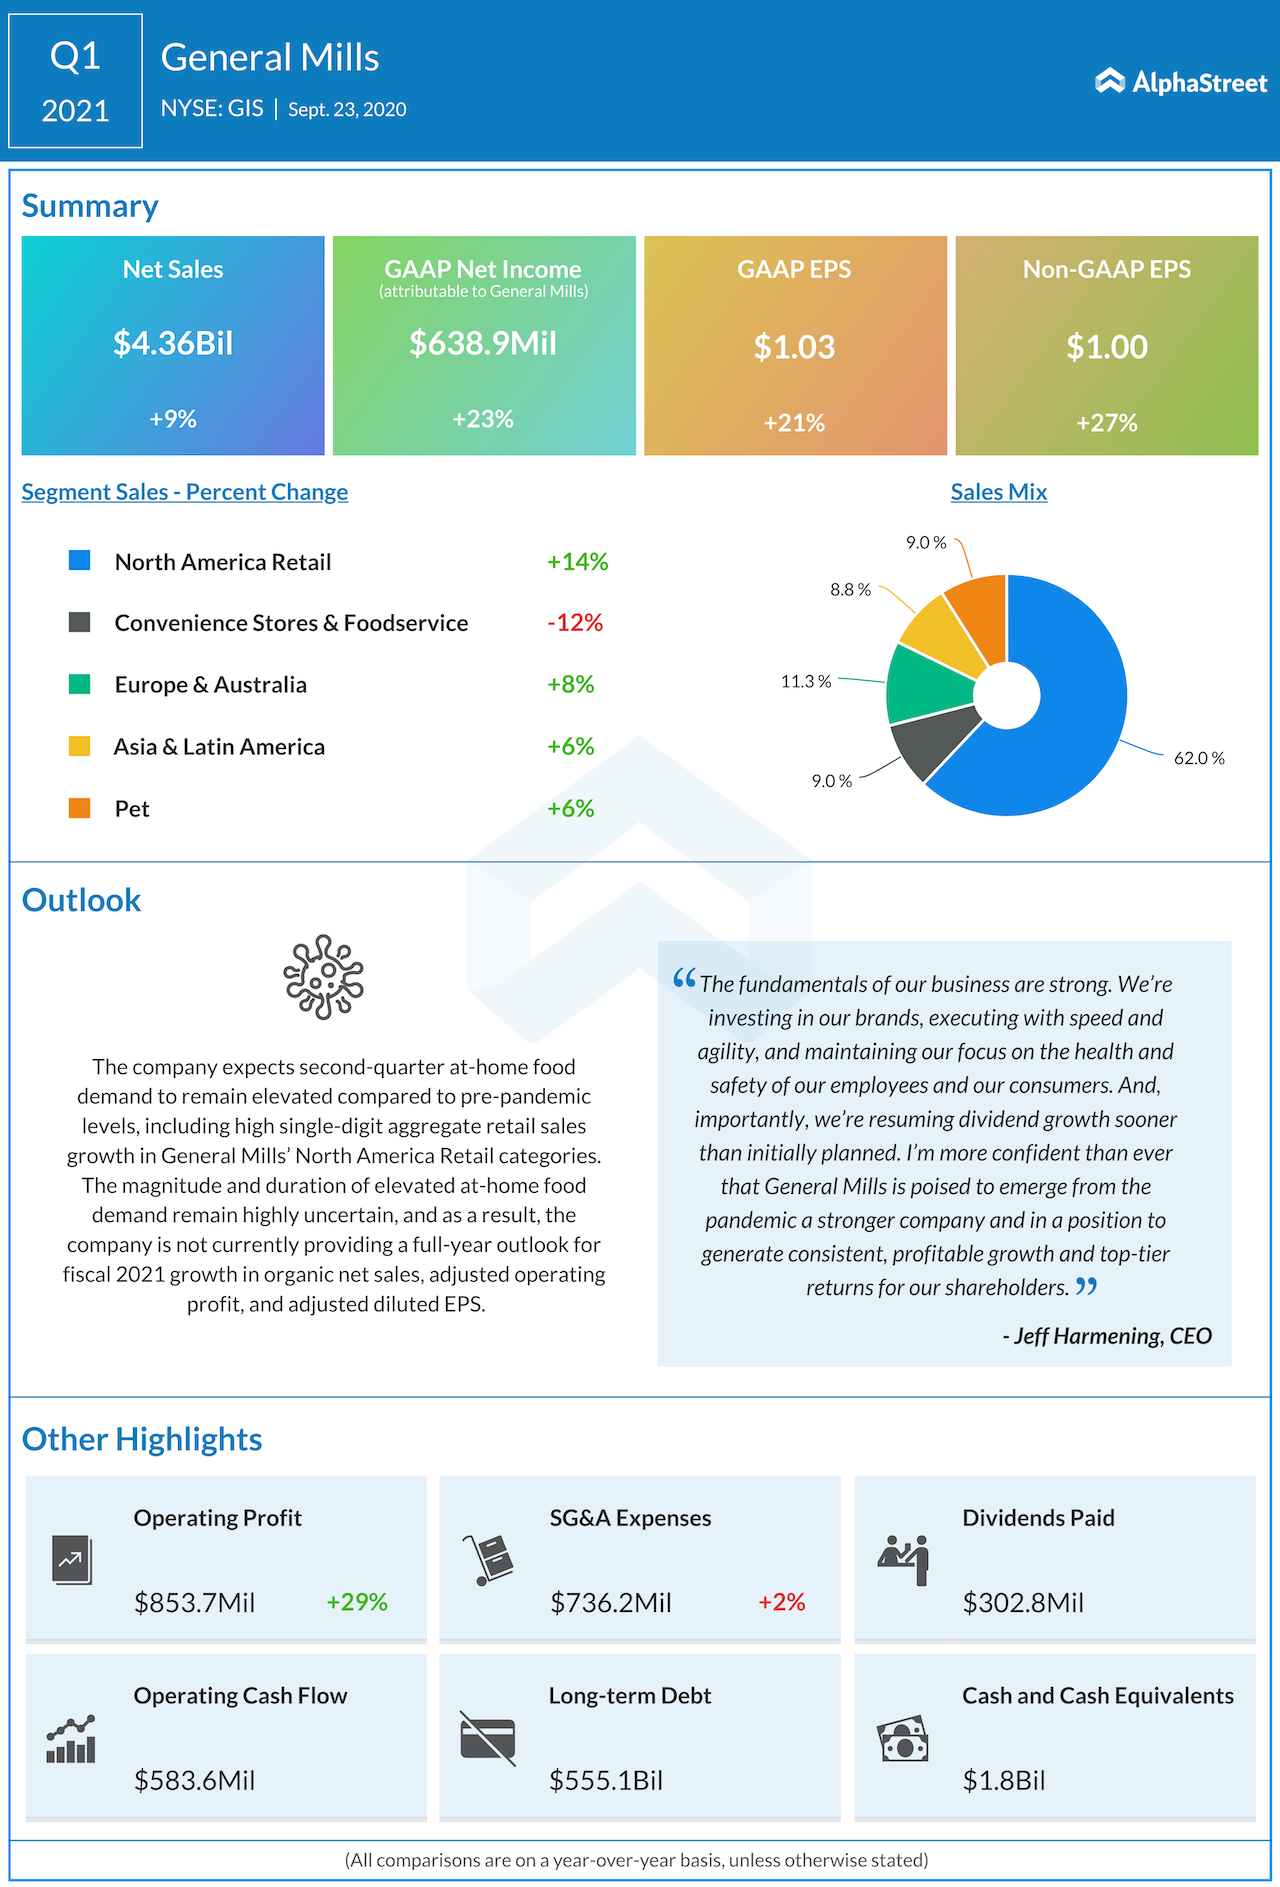 General Mills Q1 2021 earnings